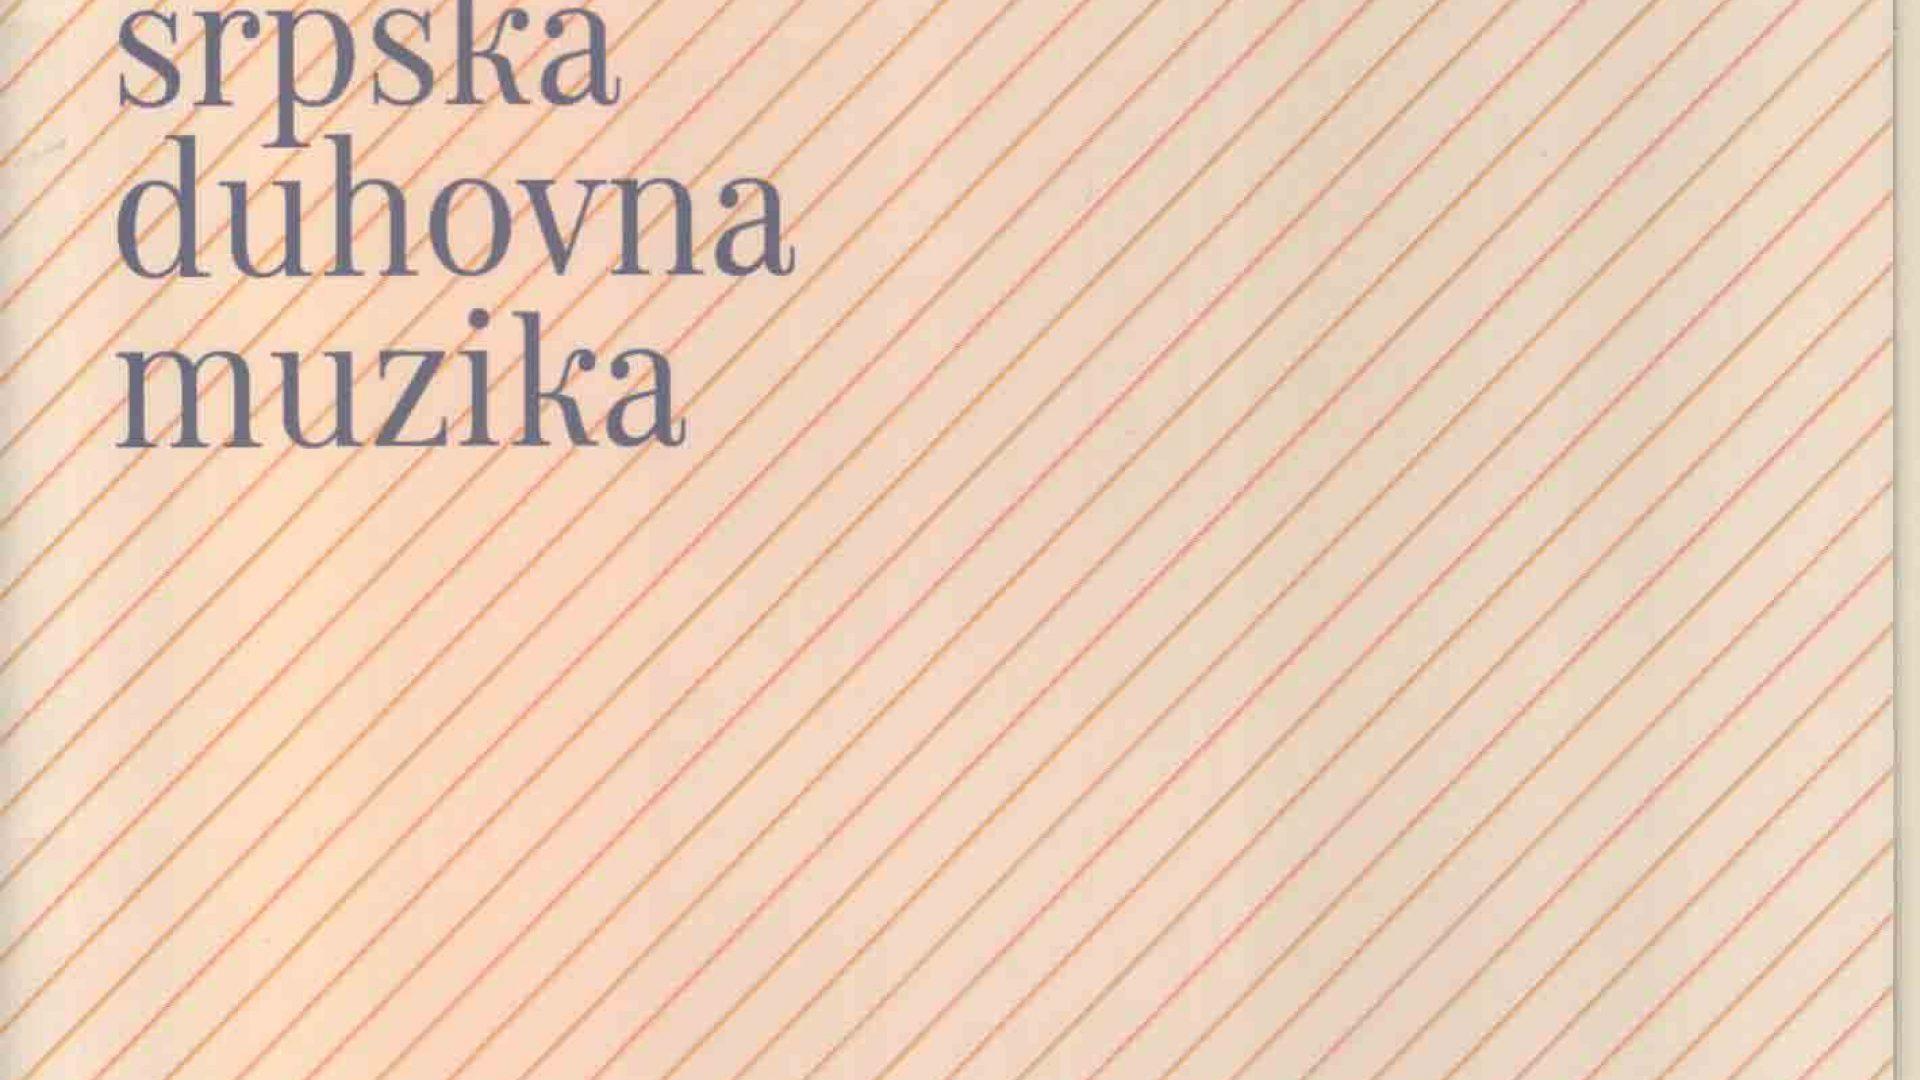 (2004.) Hor Josif Marinković – Srpska Duhovna Muzika